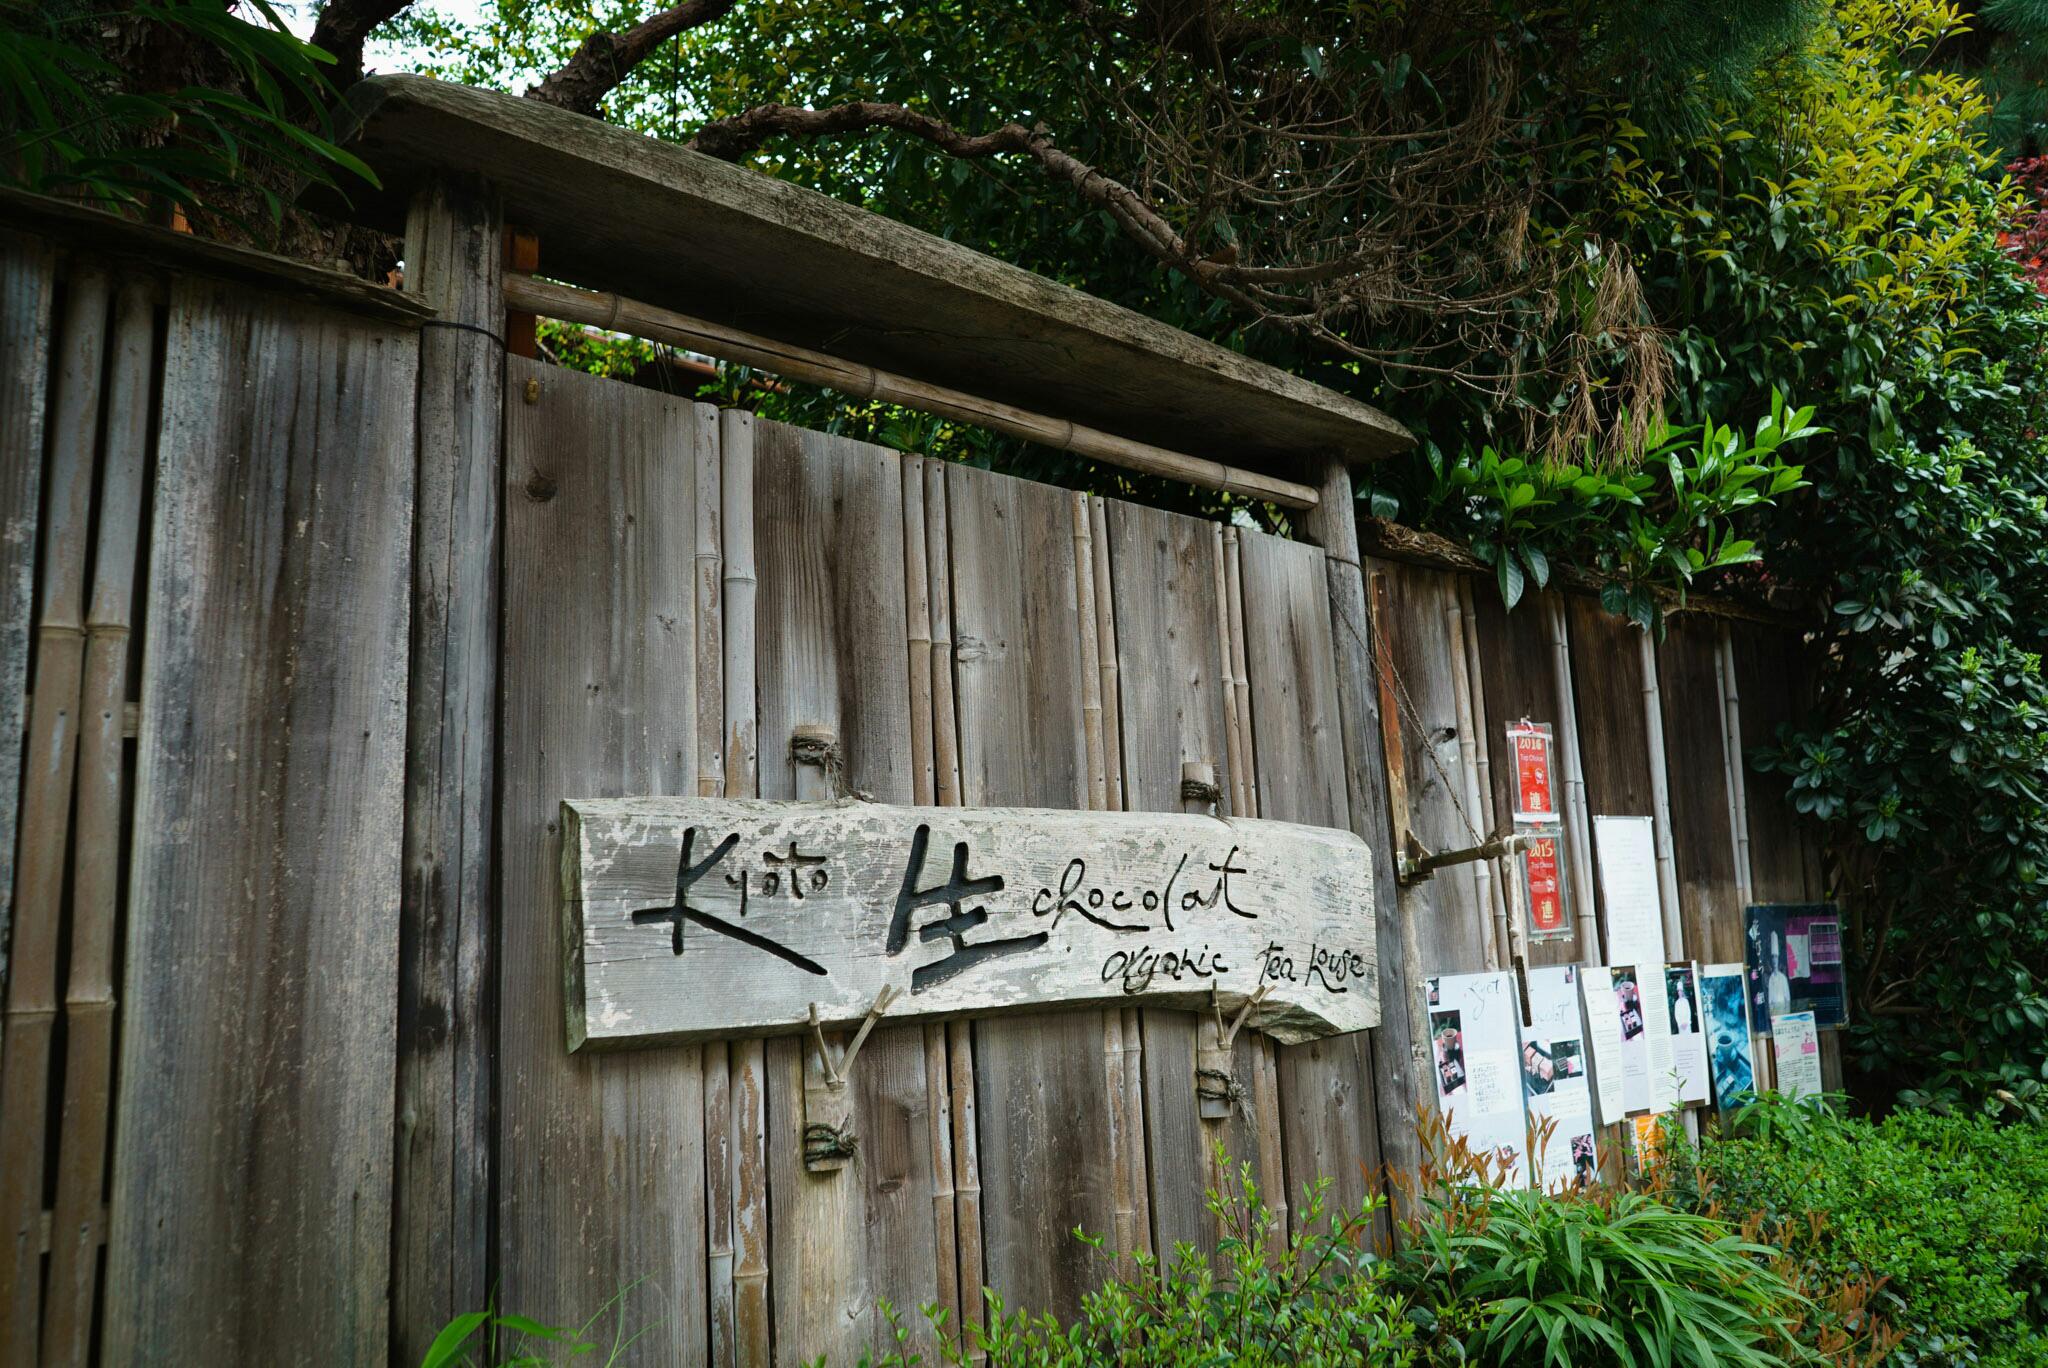 Kyoto Chocolat Organic Tea House